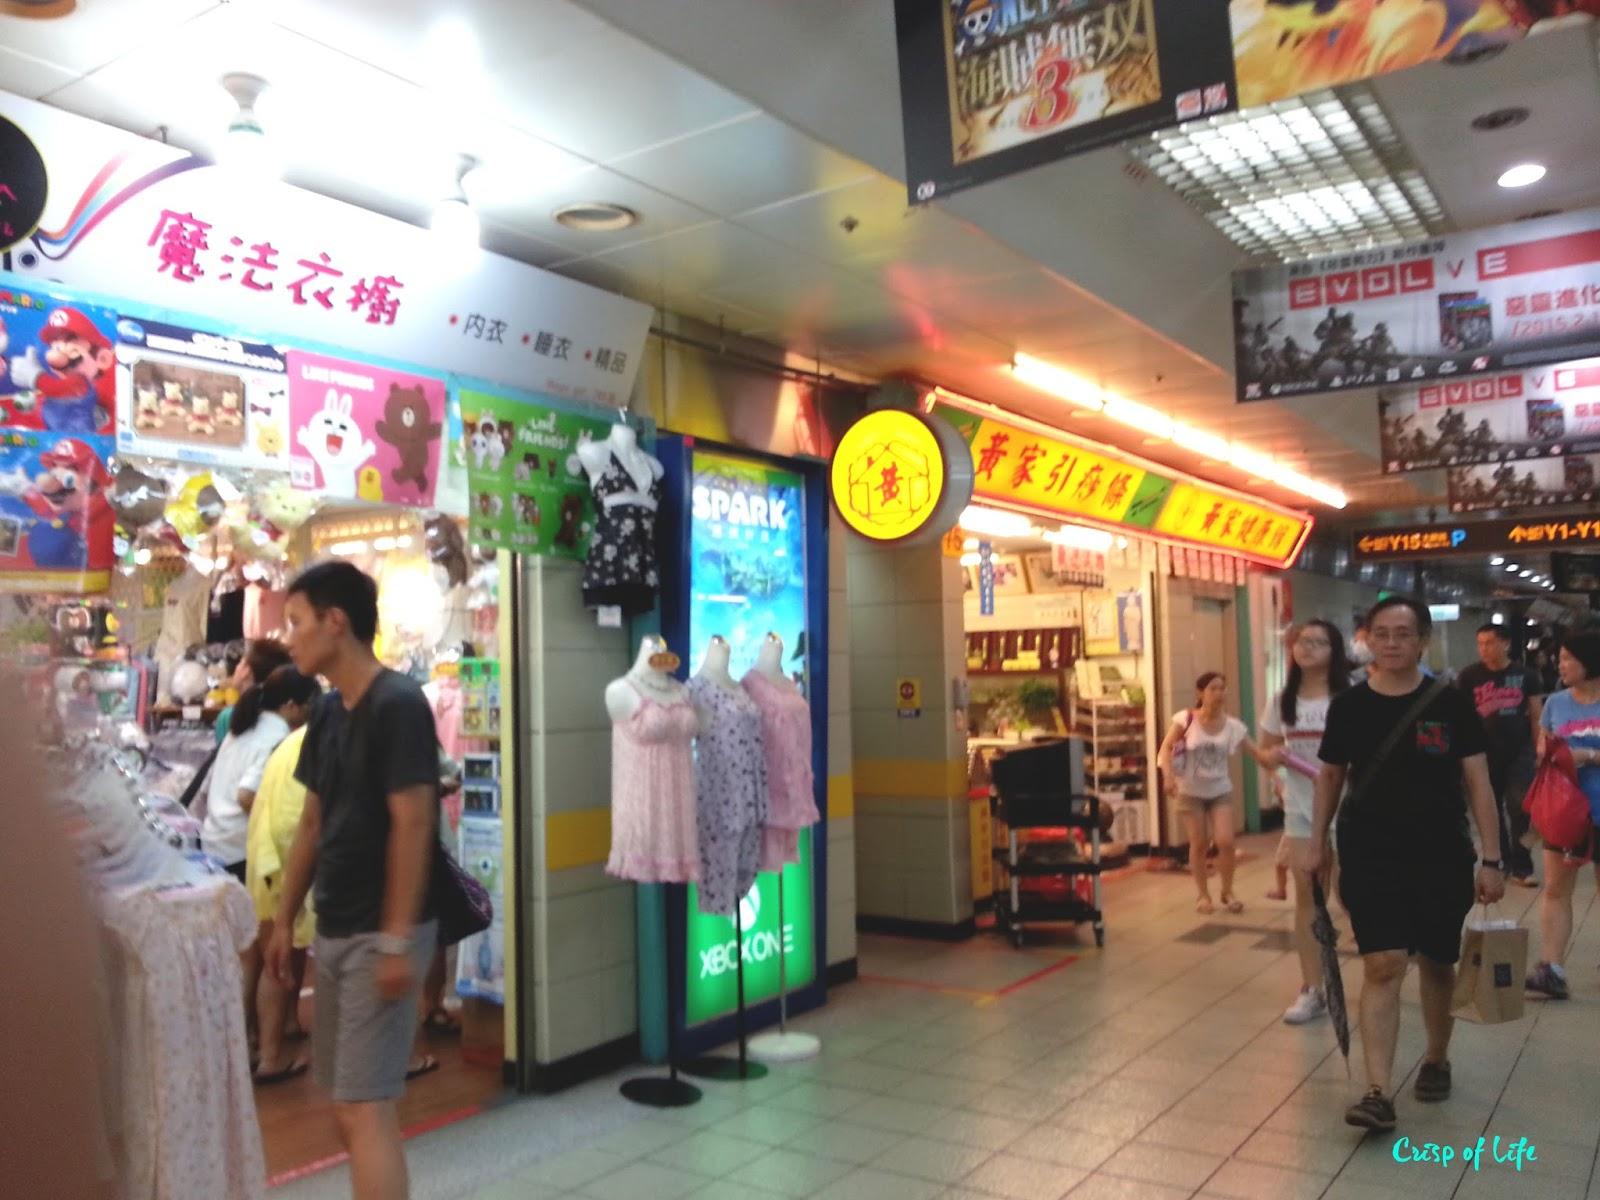 [TAIPEI 臺北] Day 8: A day at Taiwan when Chan-Hom Typhoon strikes 第八天:在昌鴻臺風中的一天